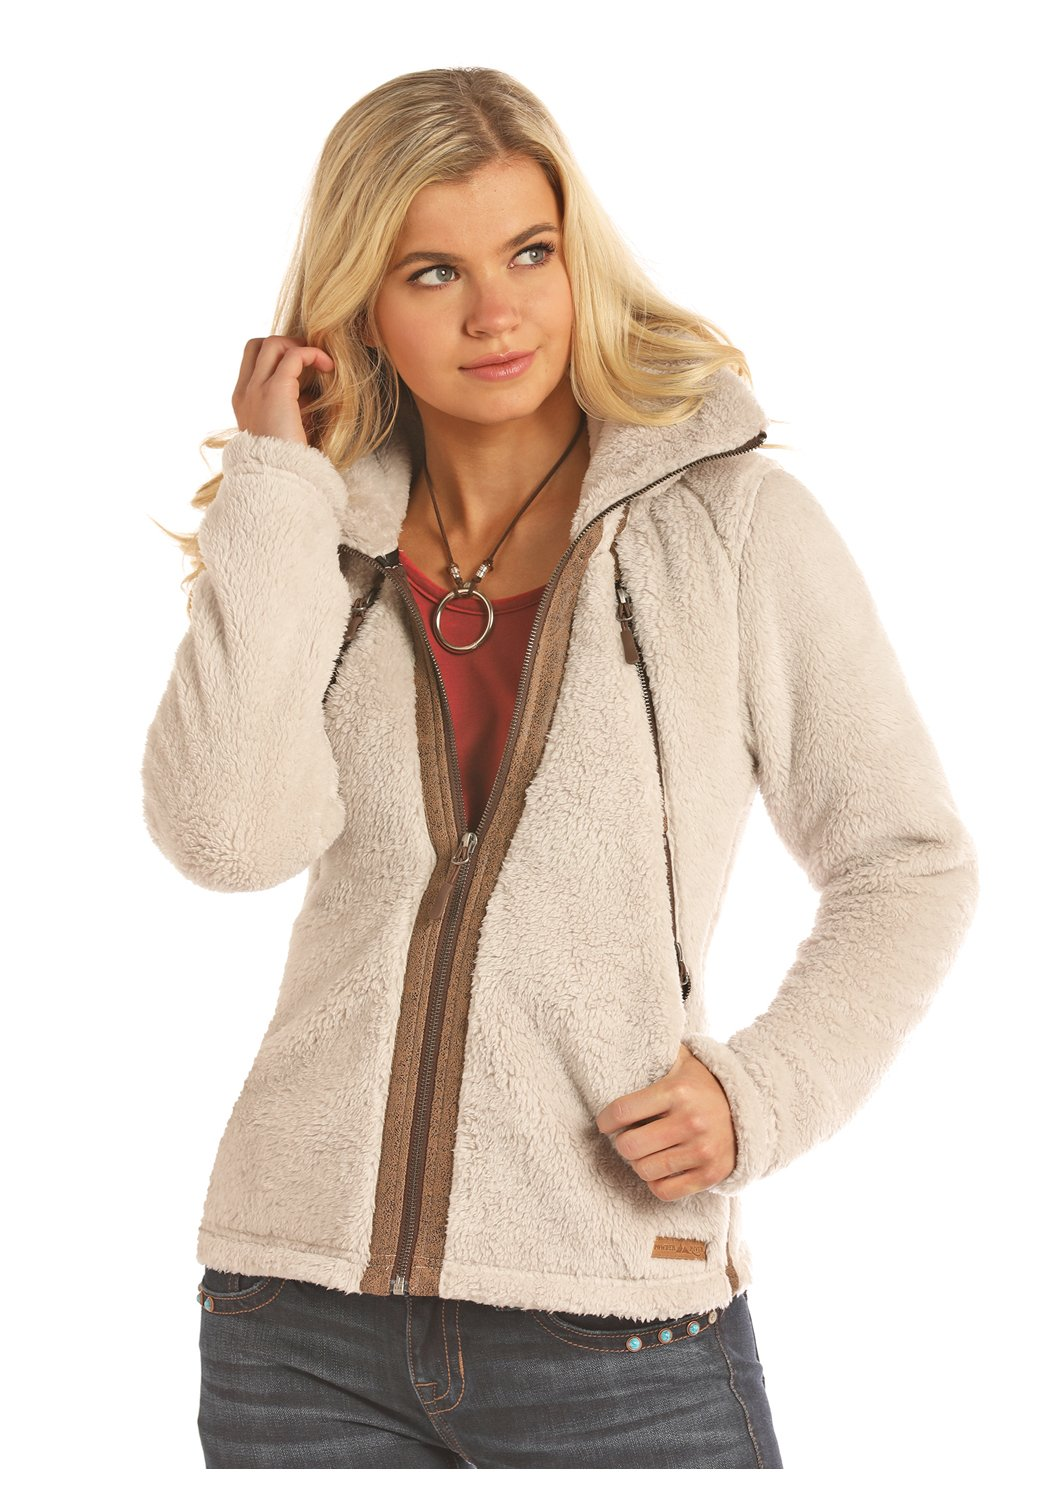 Fleece Jacket from Powder River